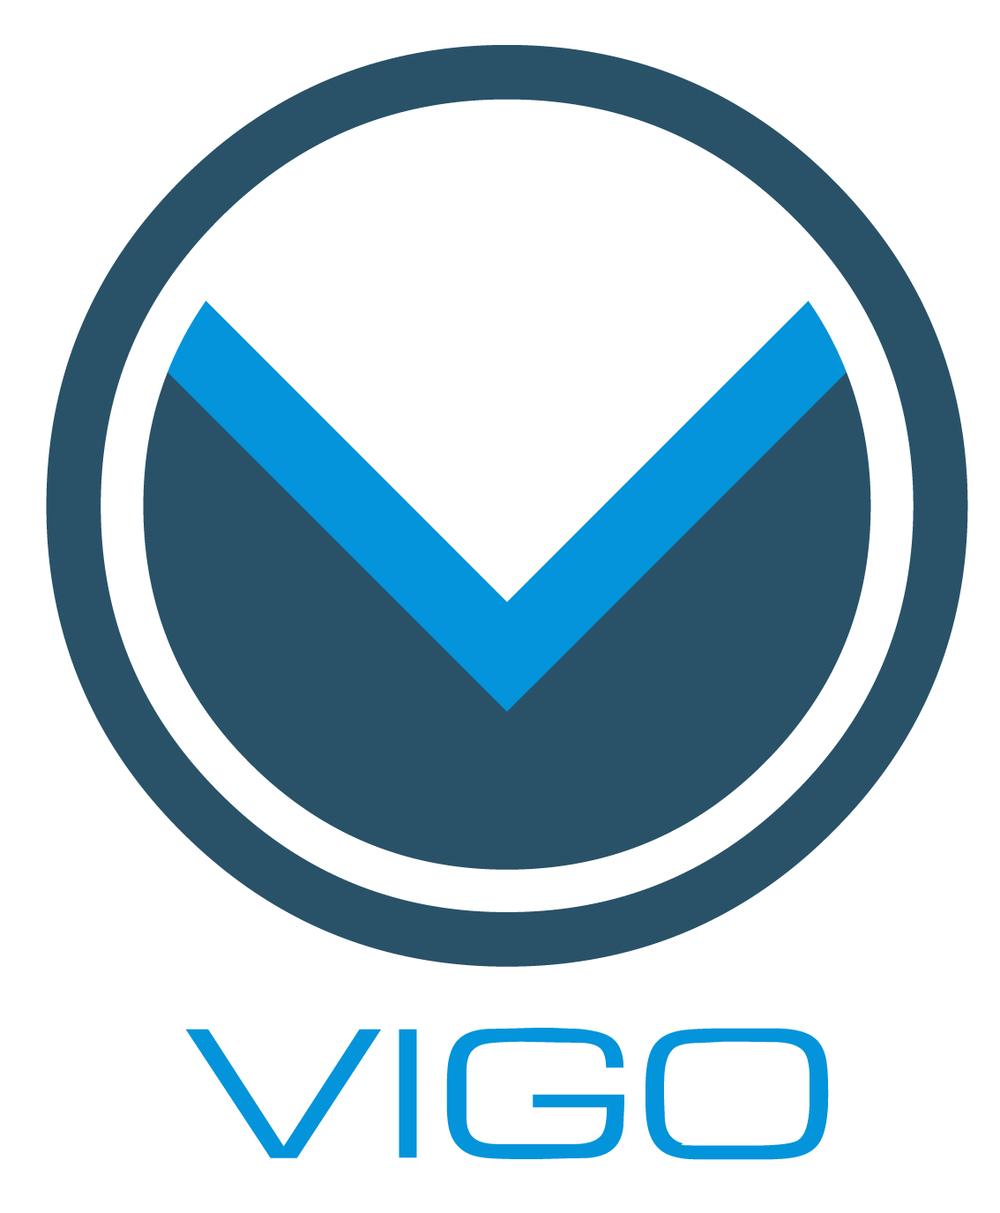 VigoLogo-01.jpg